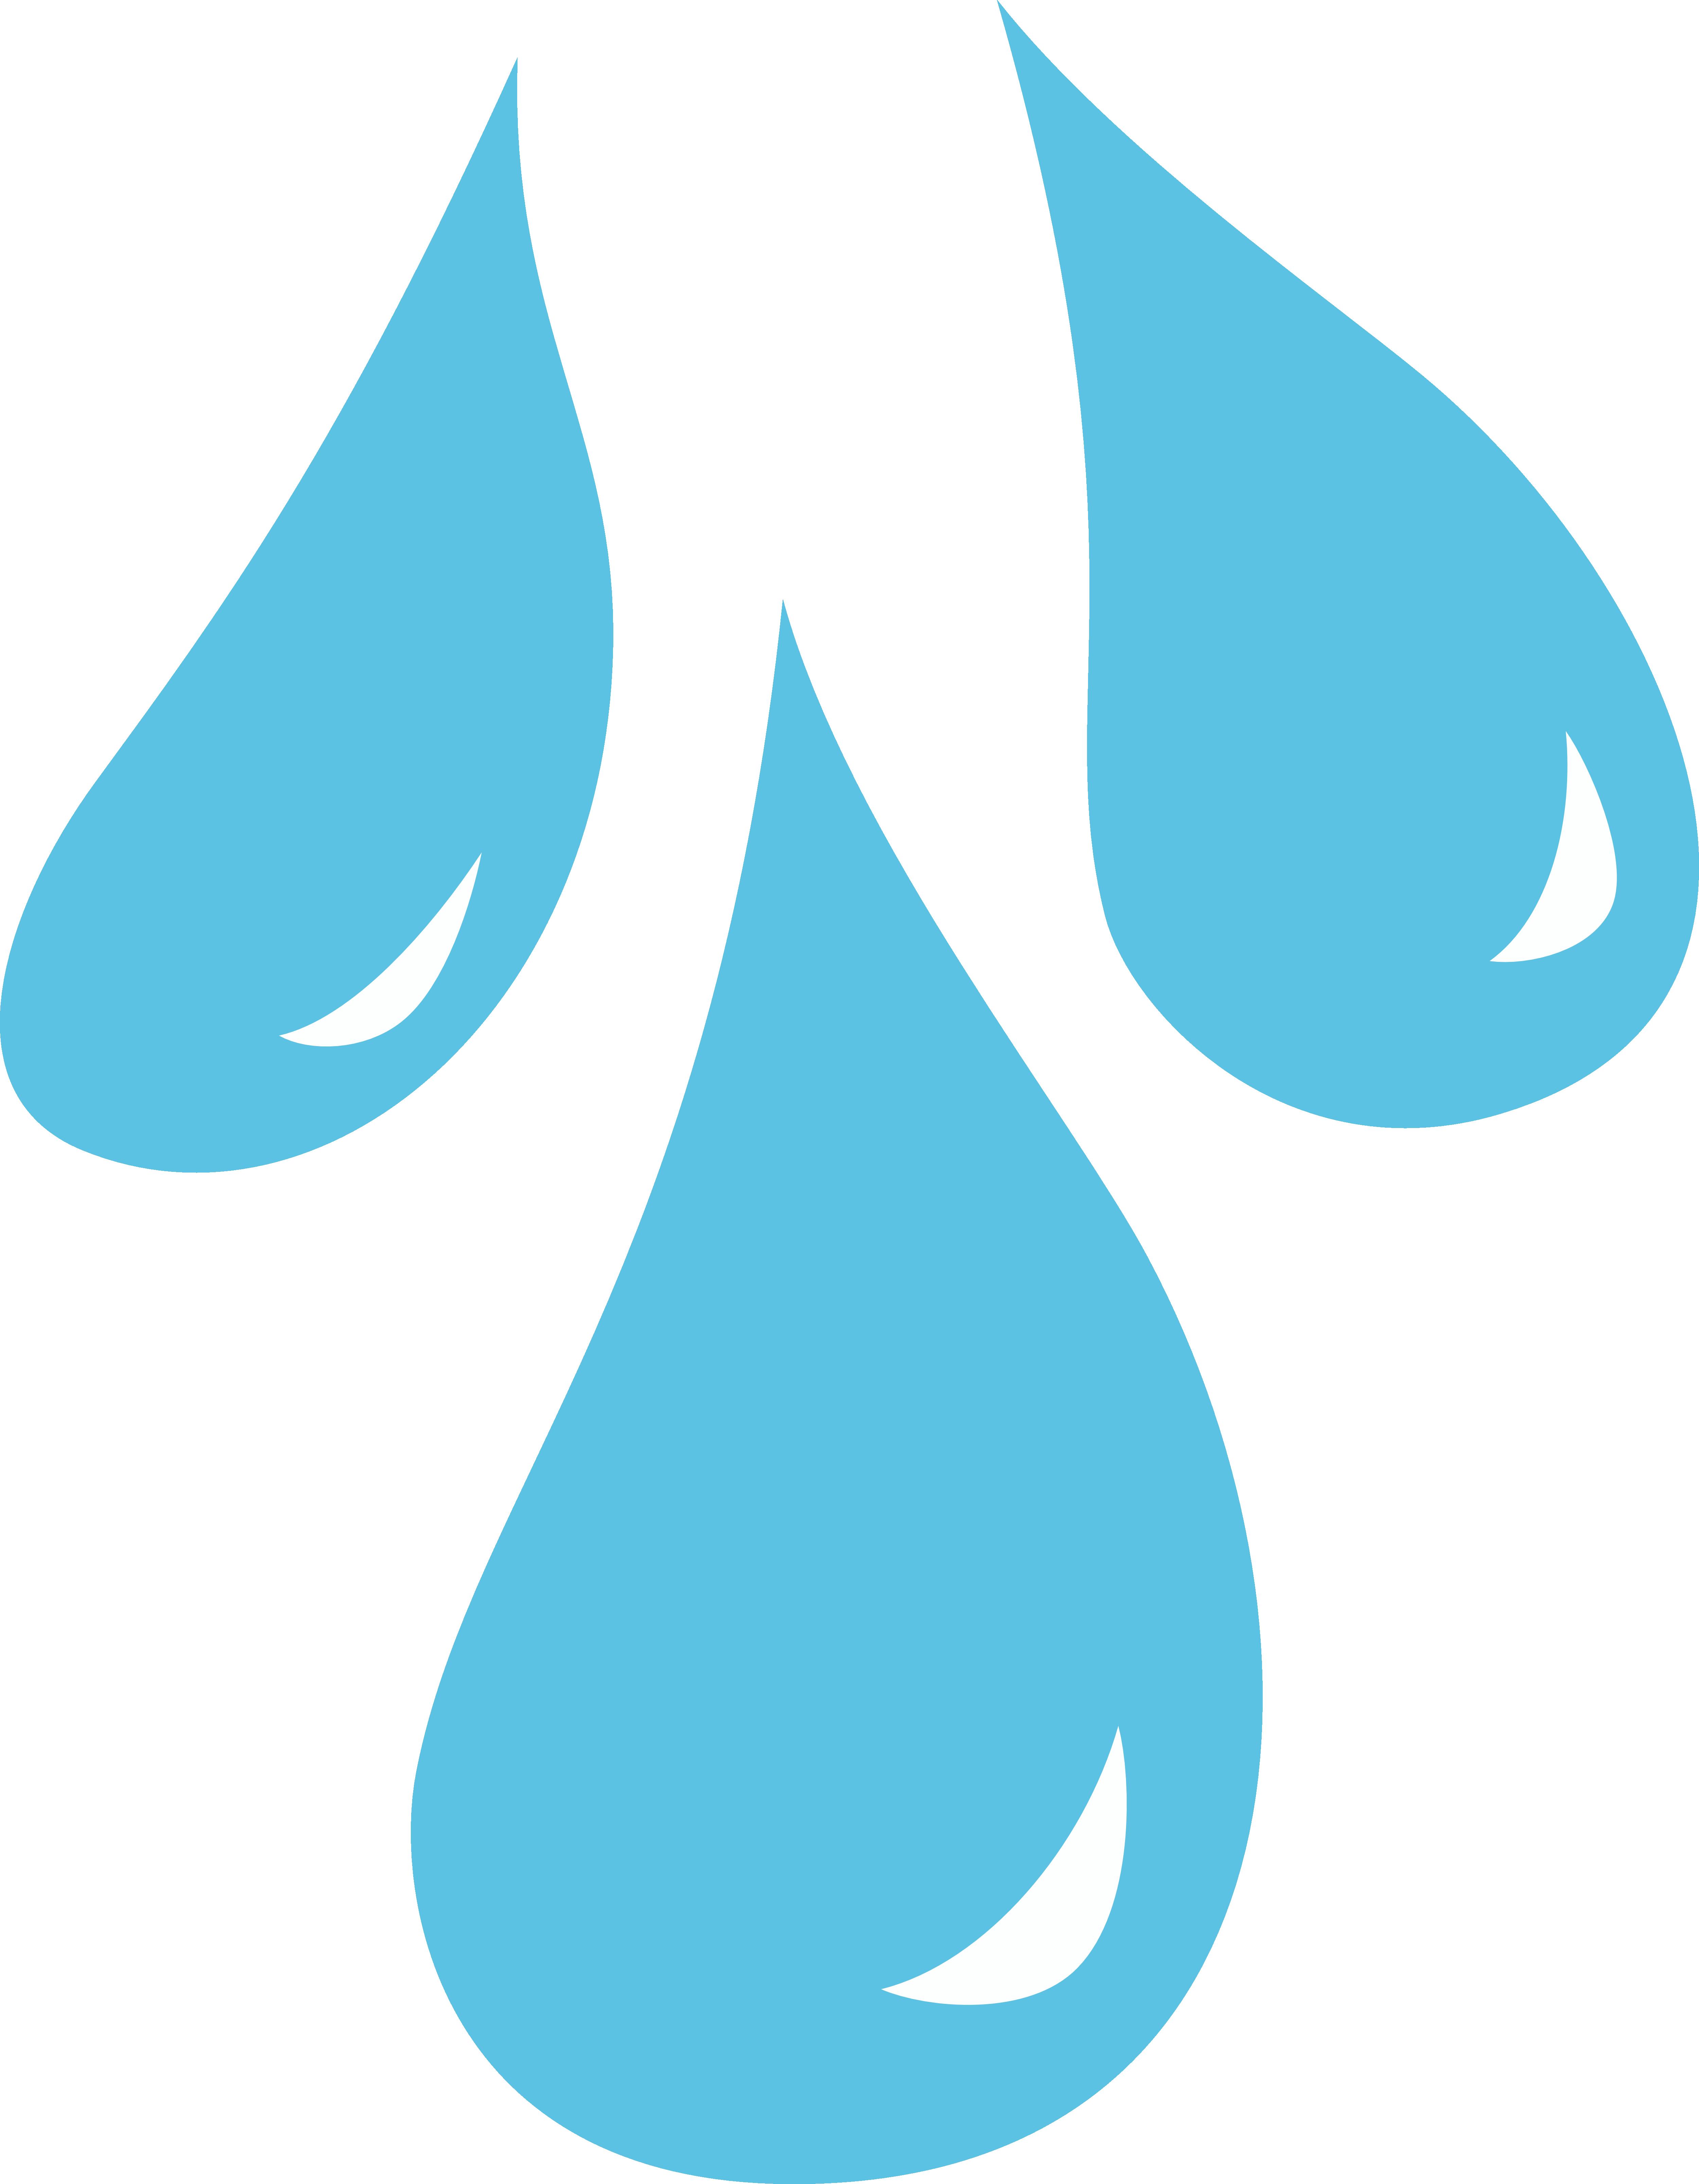 Water Drop clipart #9, Download drawings